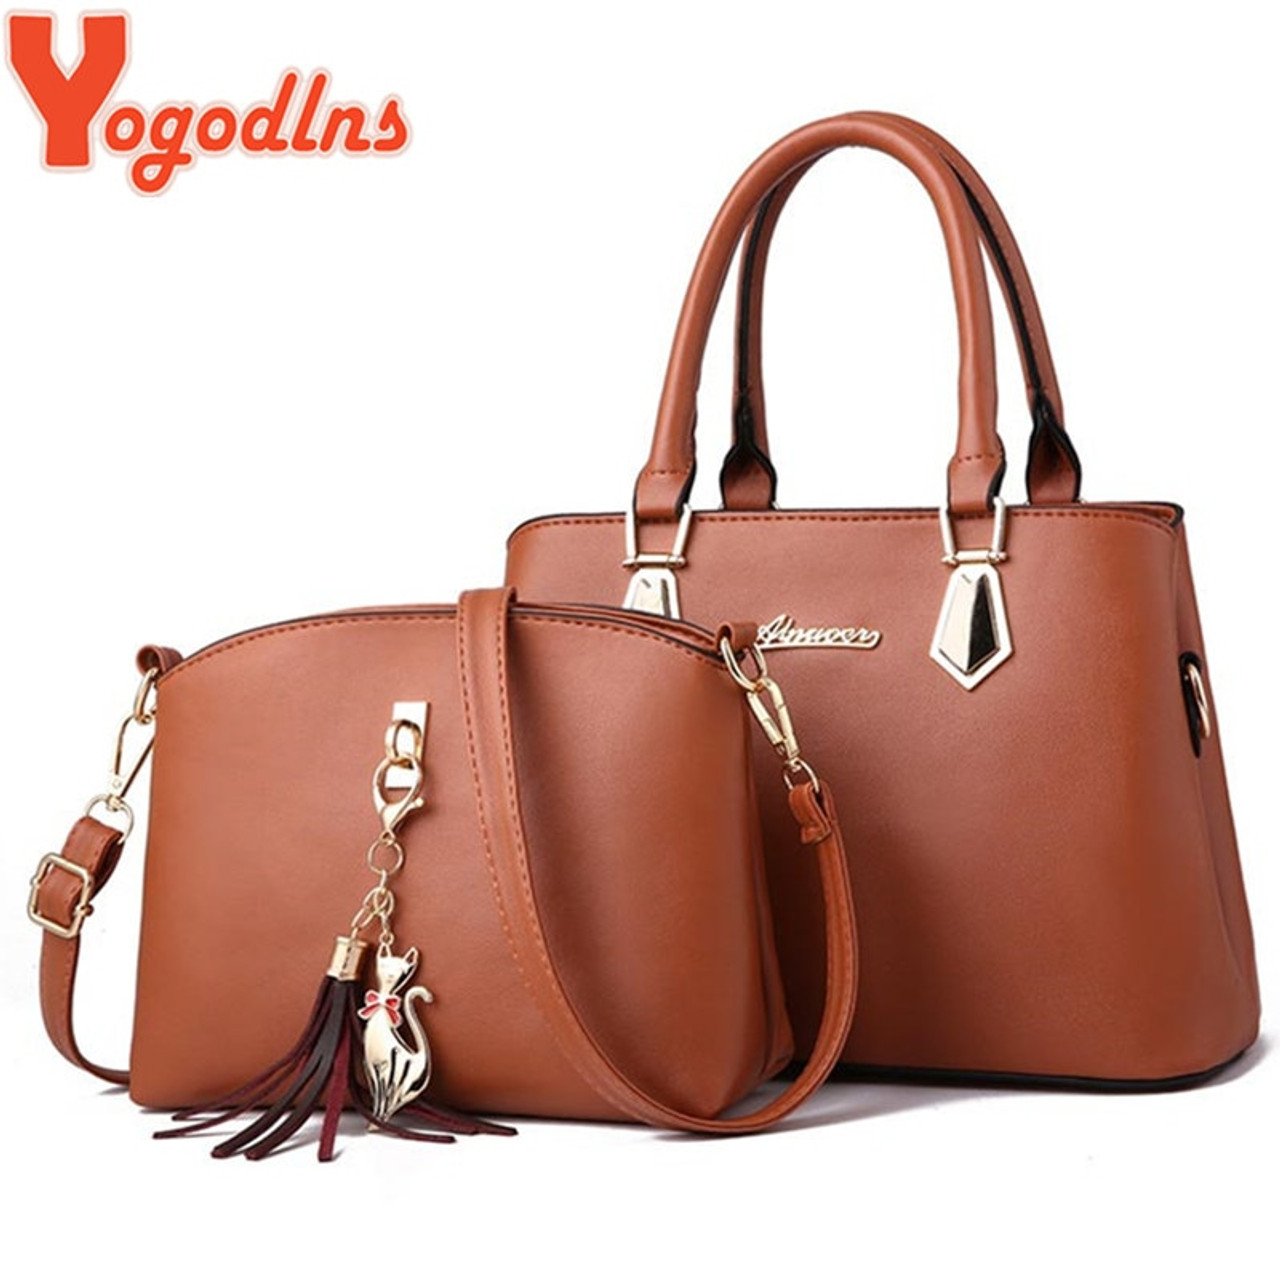 9fa693ac70ce Yogodlns New Luxury Women Bag 2 Pieces Set solid bag Fashion handbag  Shoulder Messenger bag PU Leather Composite Bag Women